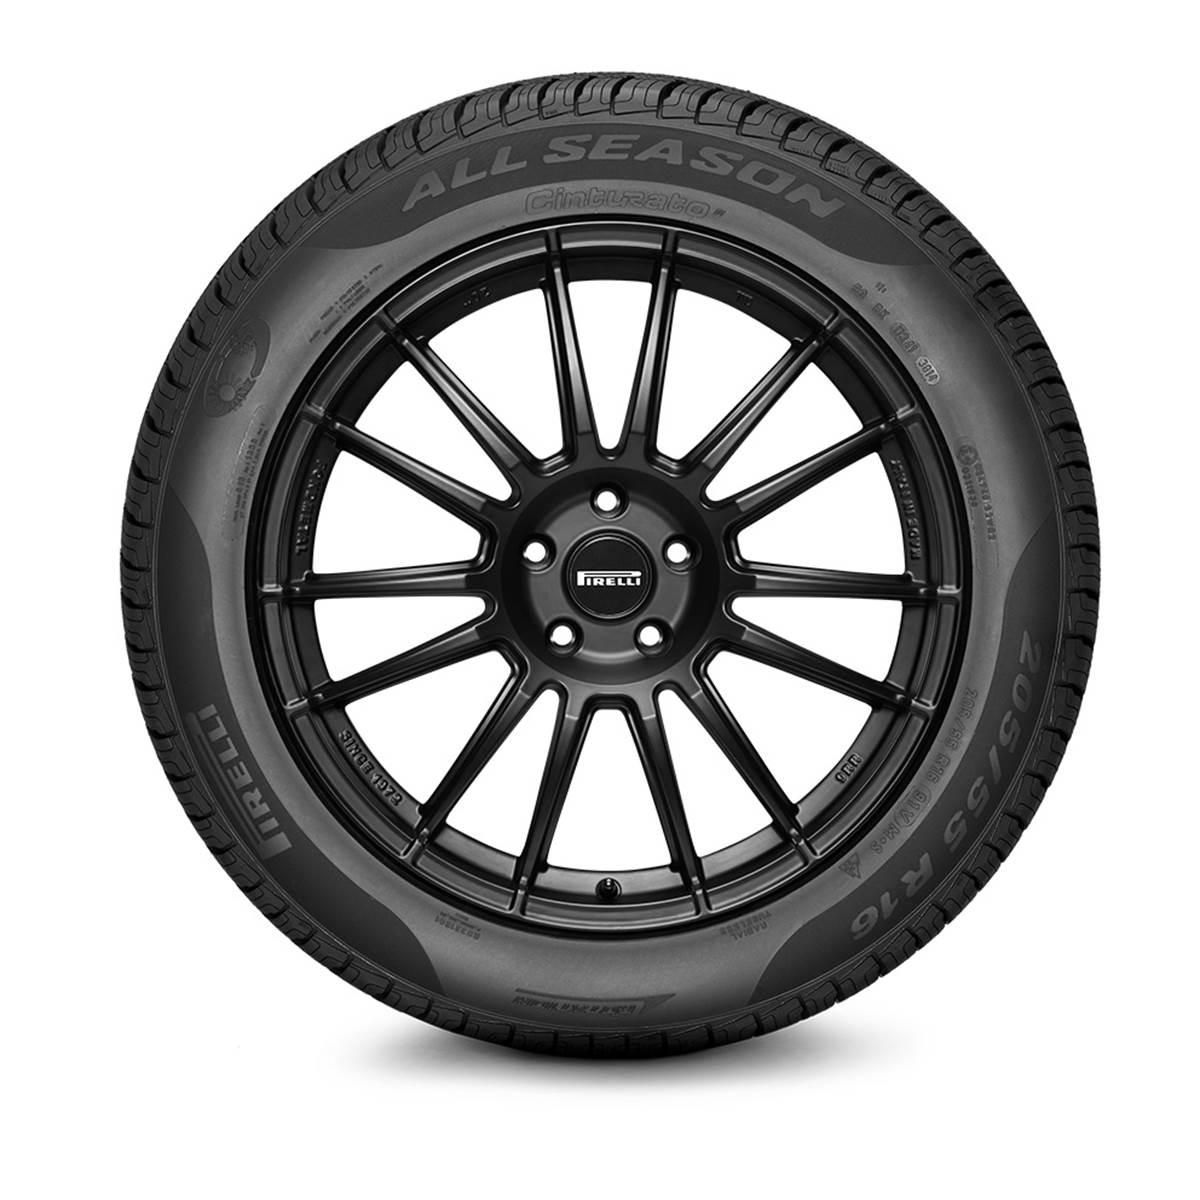 Pneu 4 Saisons Pirelli 225/50R17 98W Cinturato All Season +